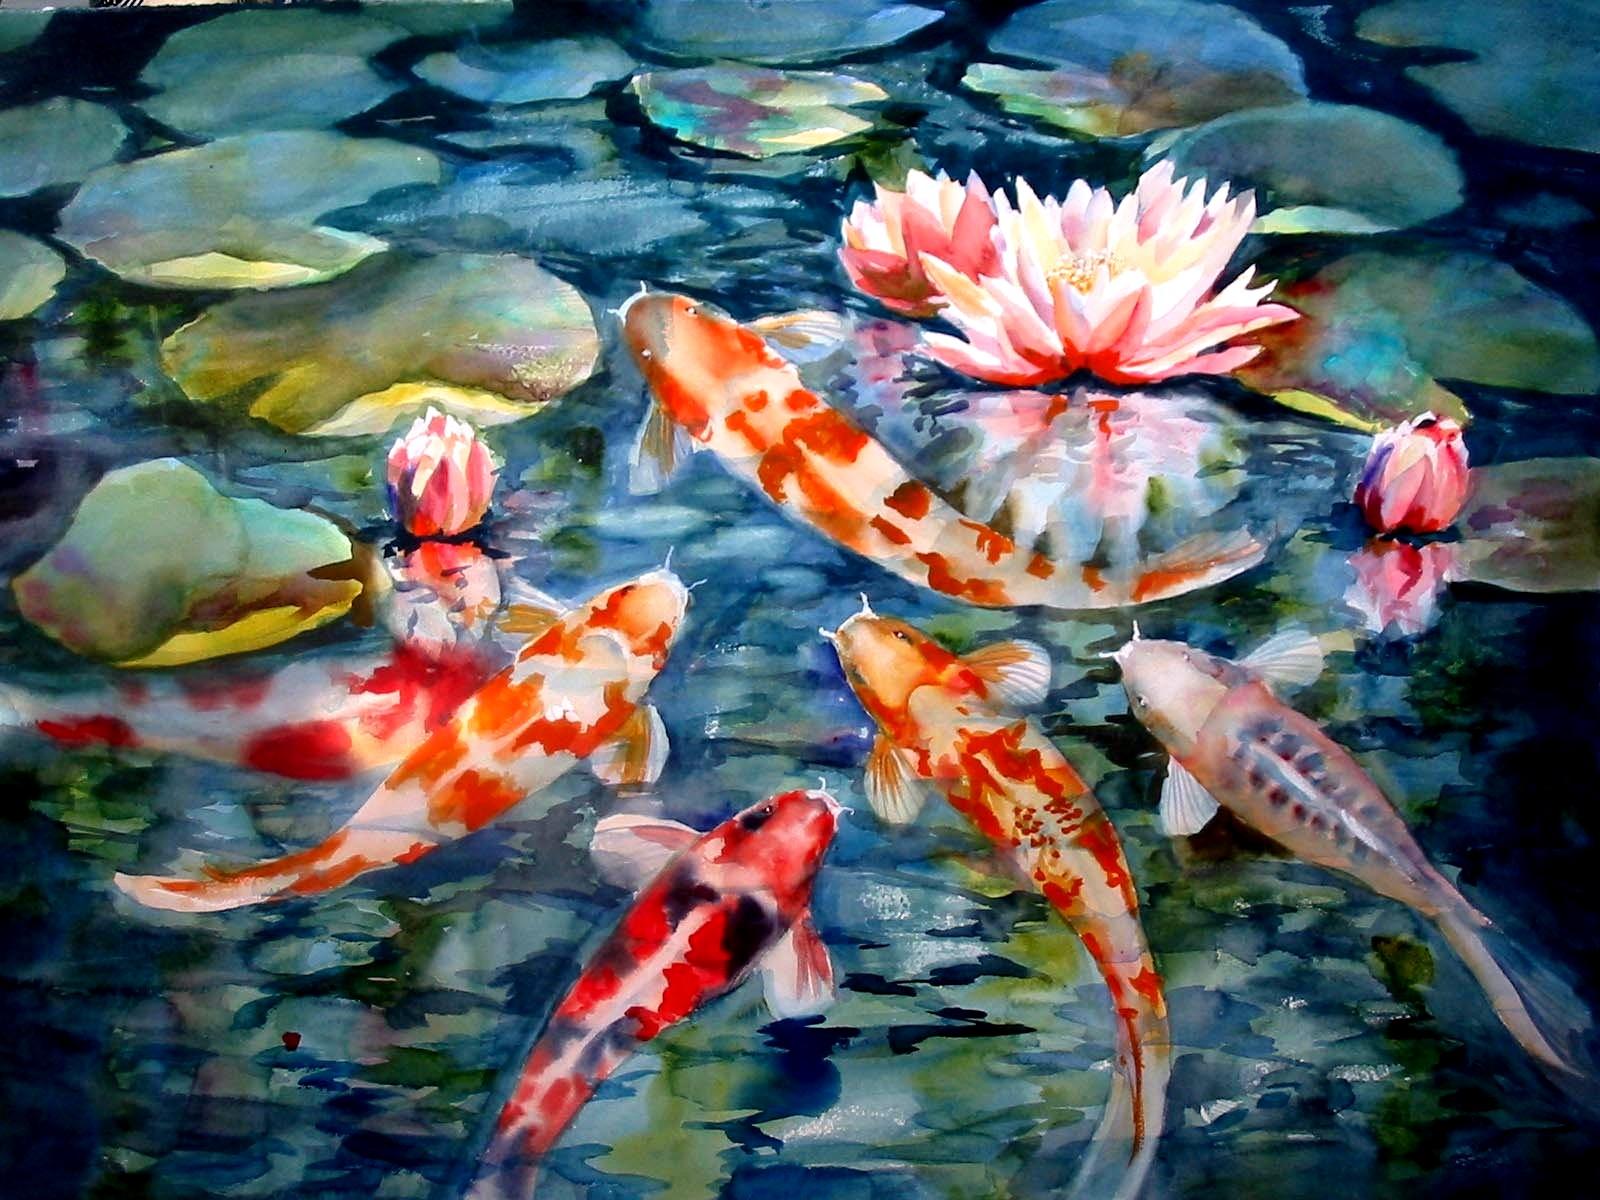 34 Hd Koi Fish Wallpaper On Wallpapersafari